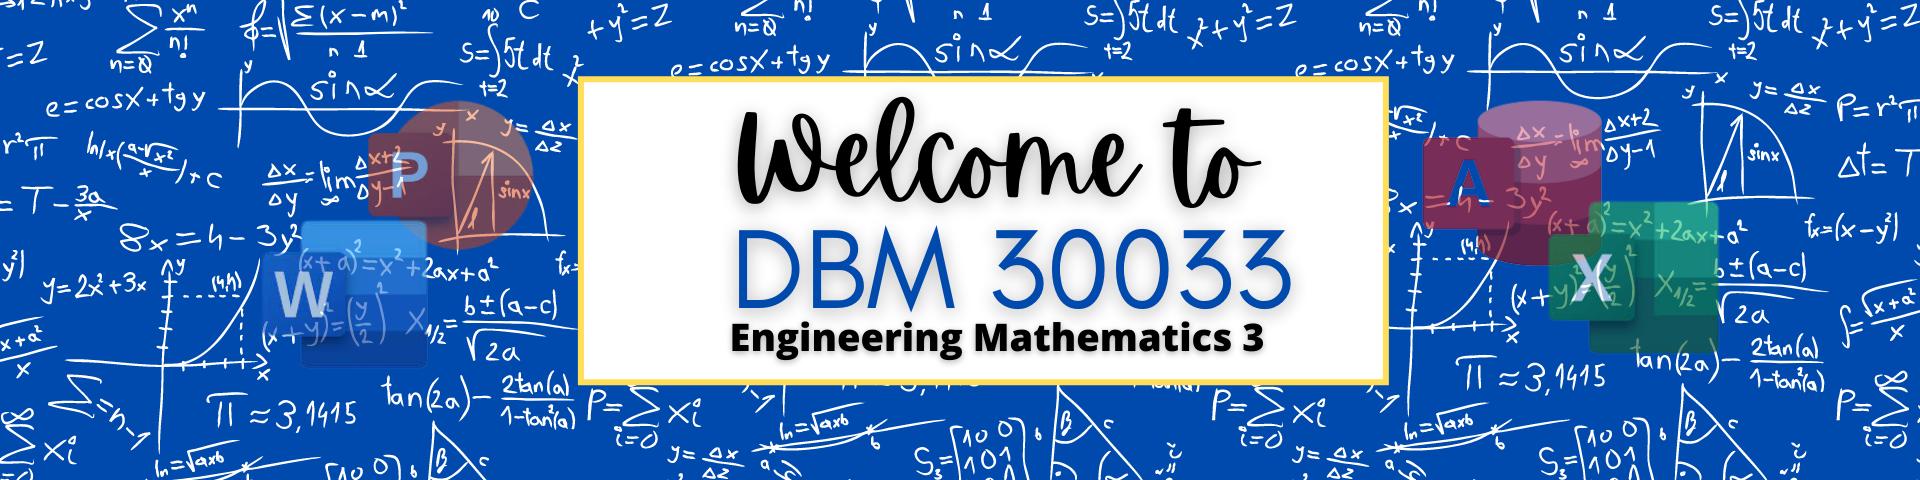 DBM 30033 ENGINEERING MATHEMATICS 3